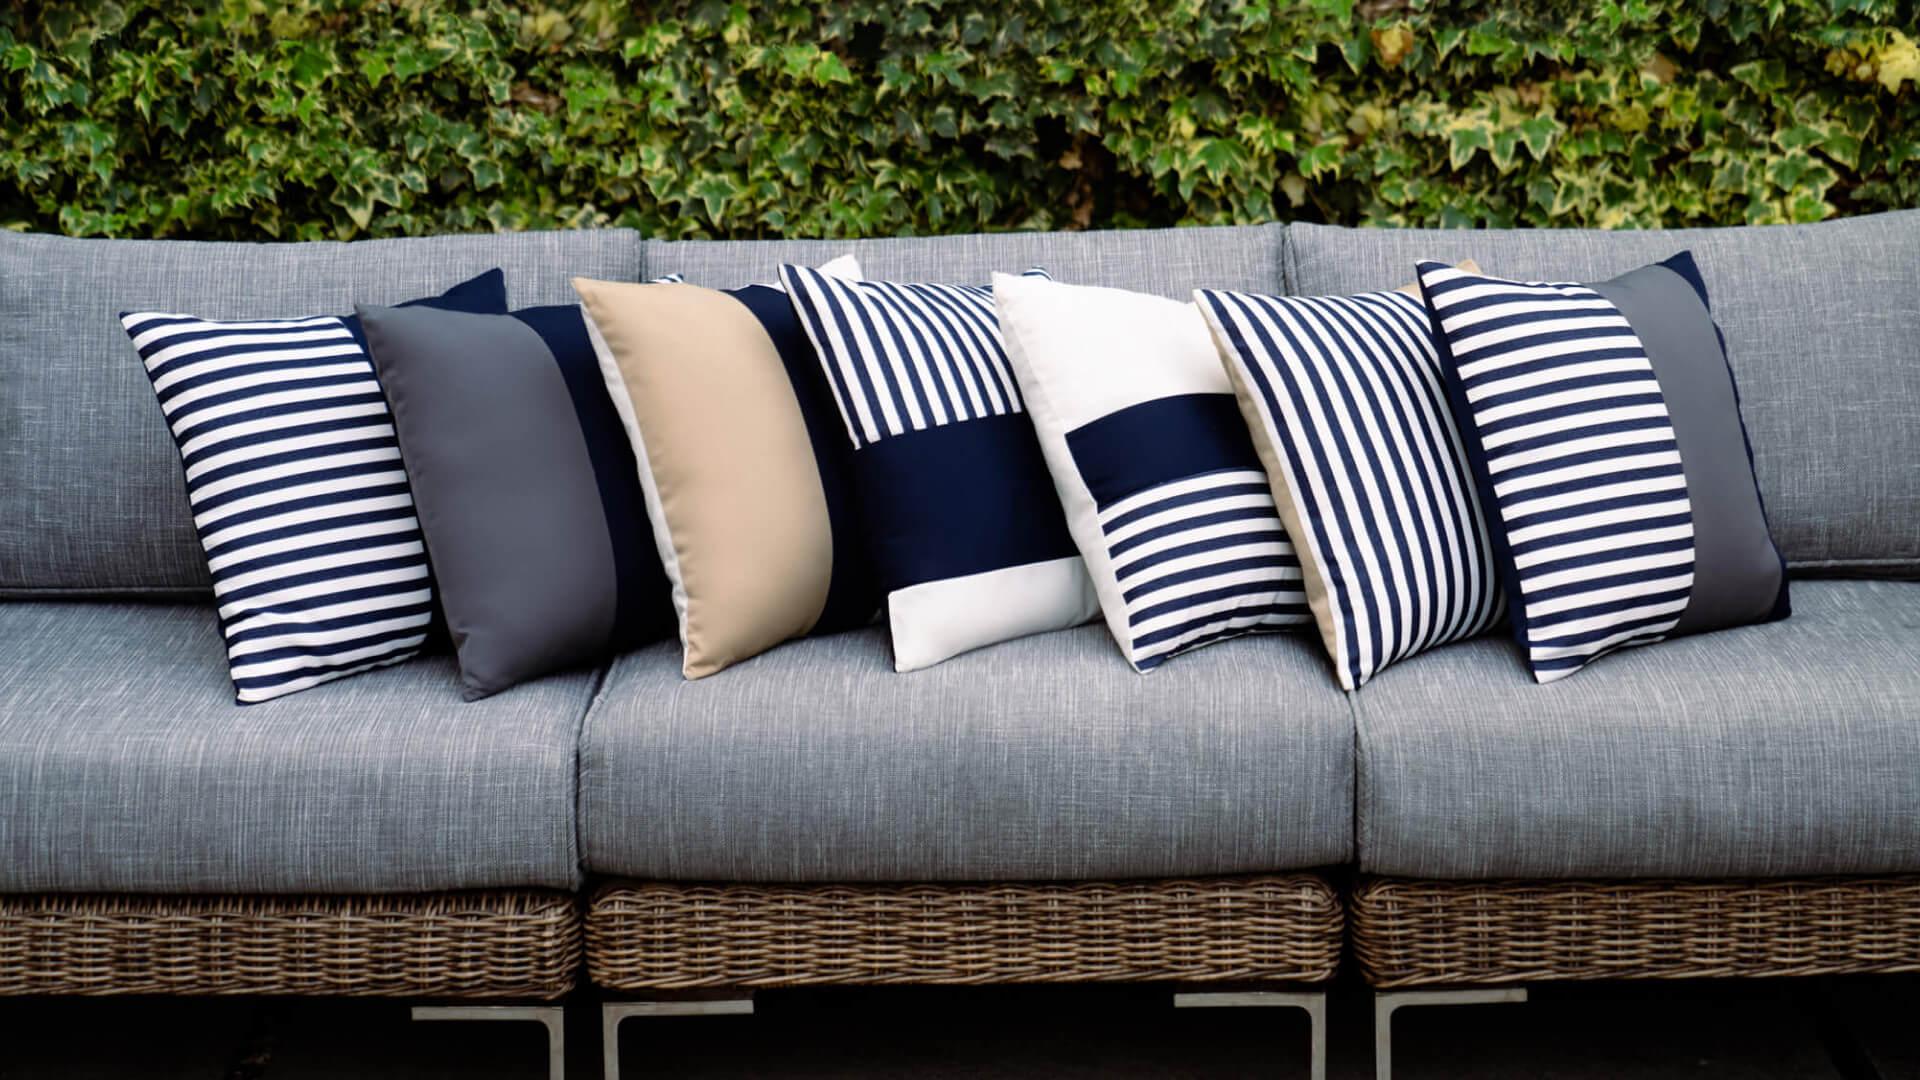 Behind the Design: Outdoor Throw Pillows